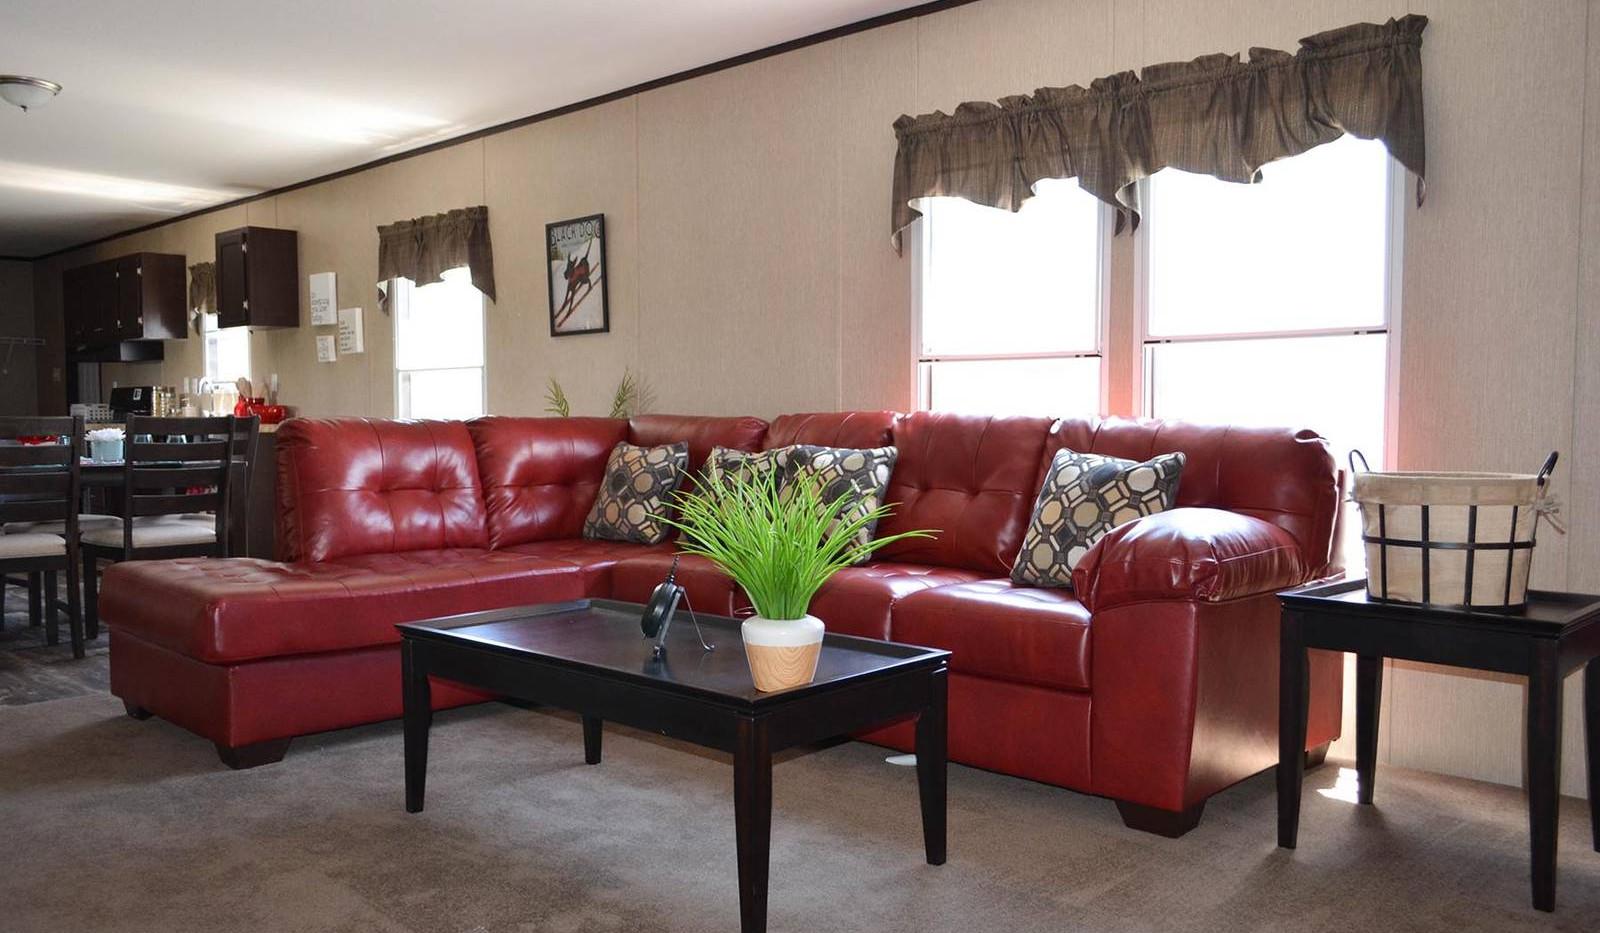 2-E12RM2872A living room 8A-1600x1067.jp